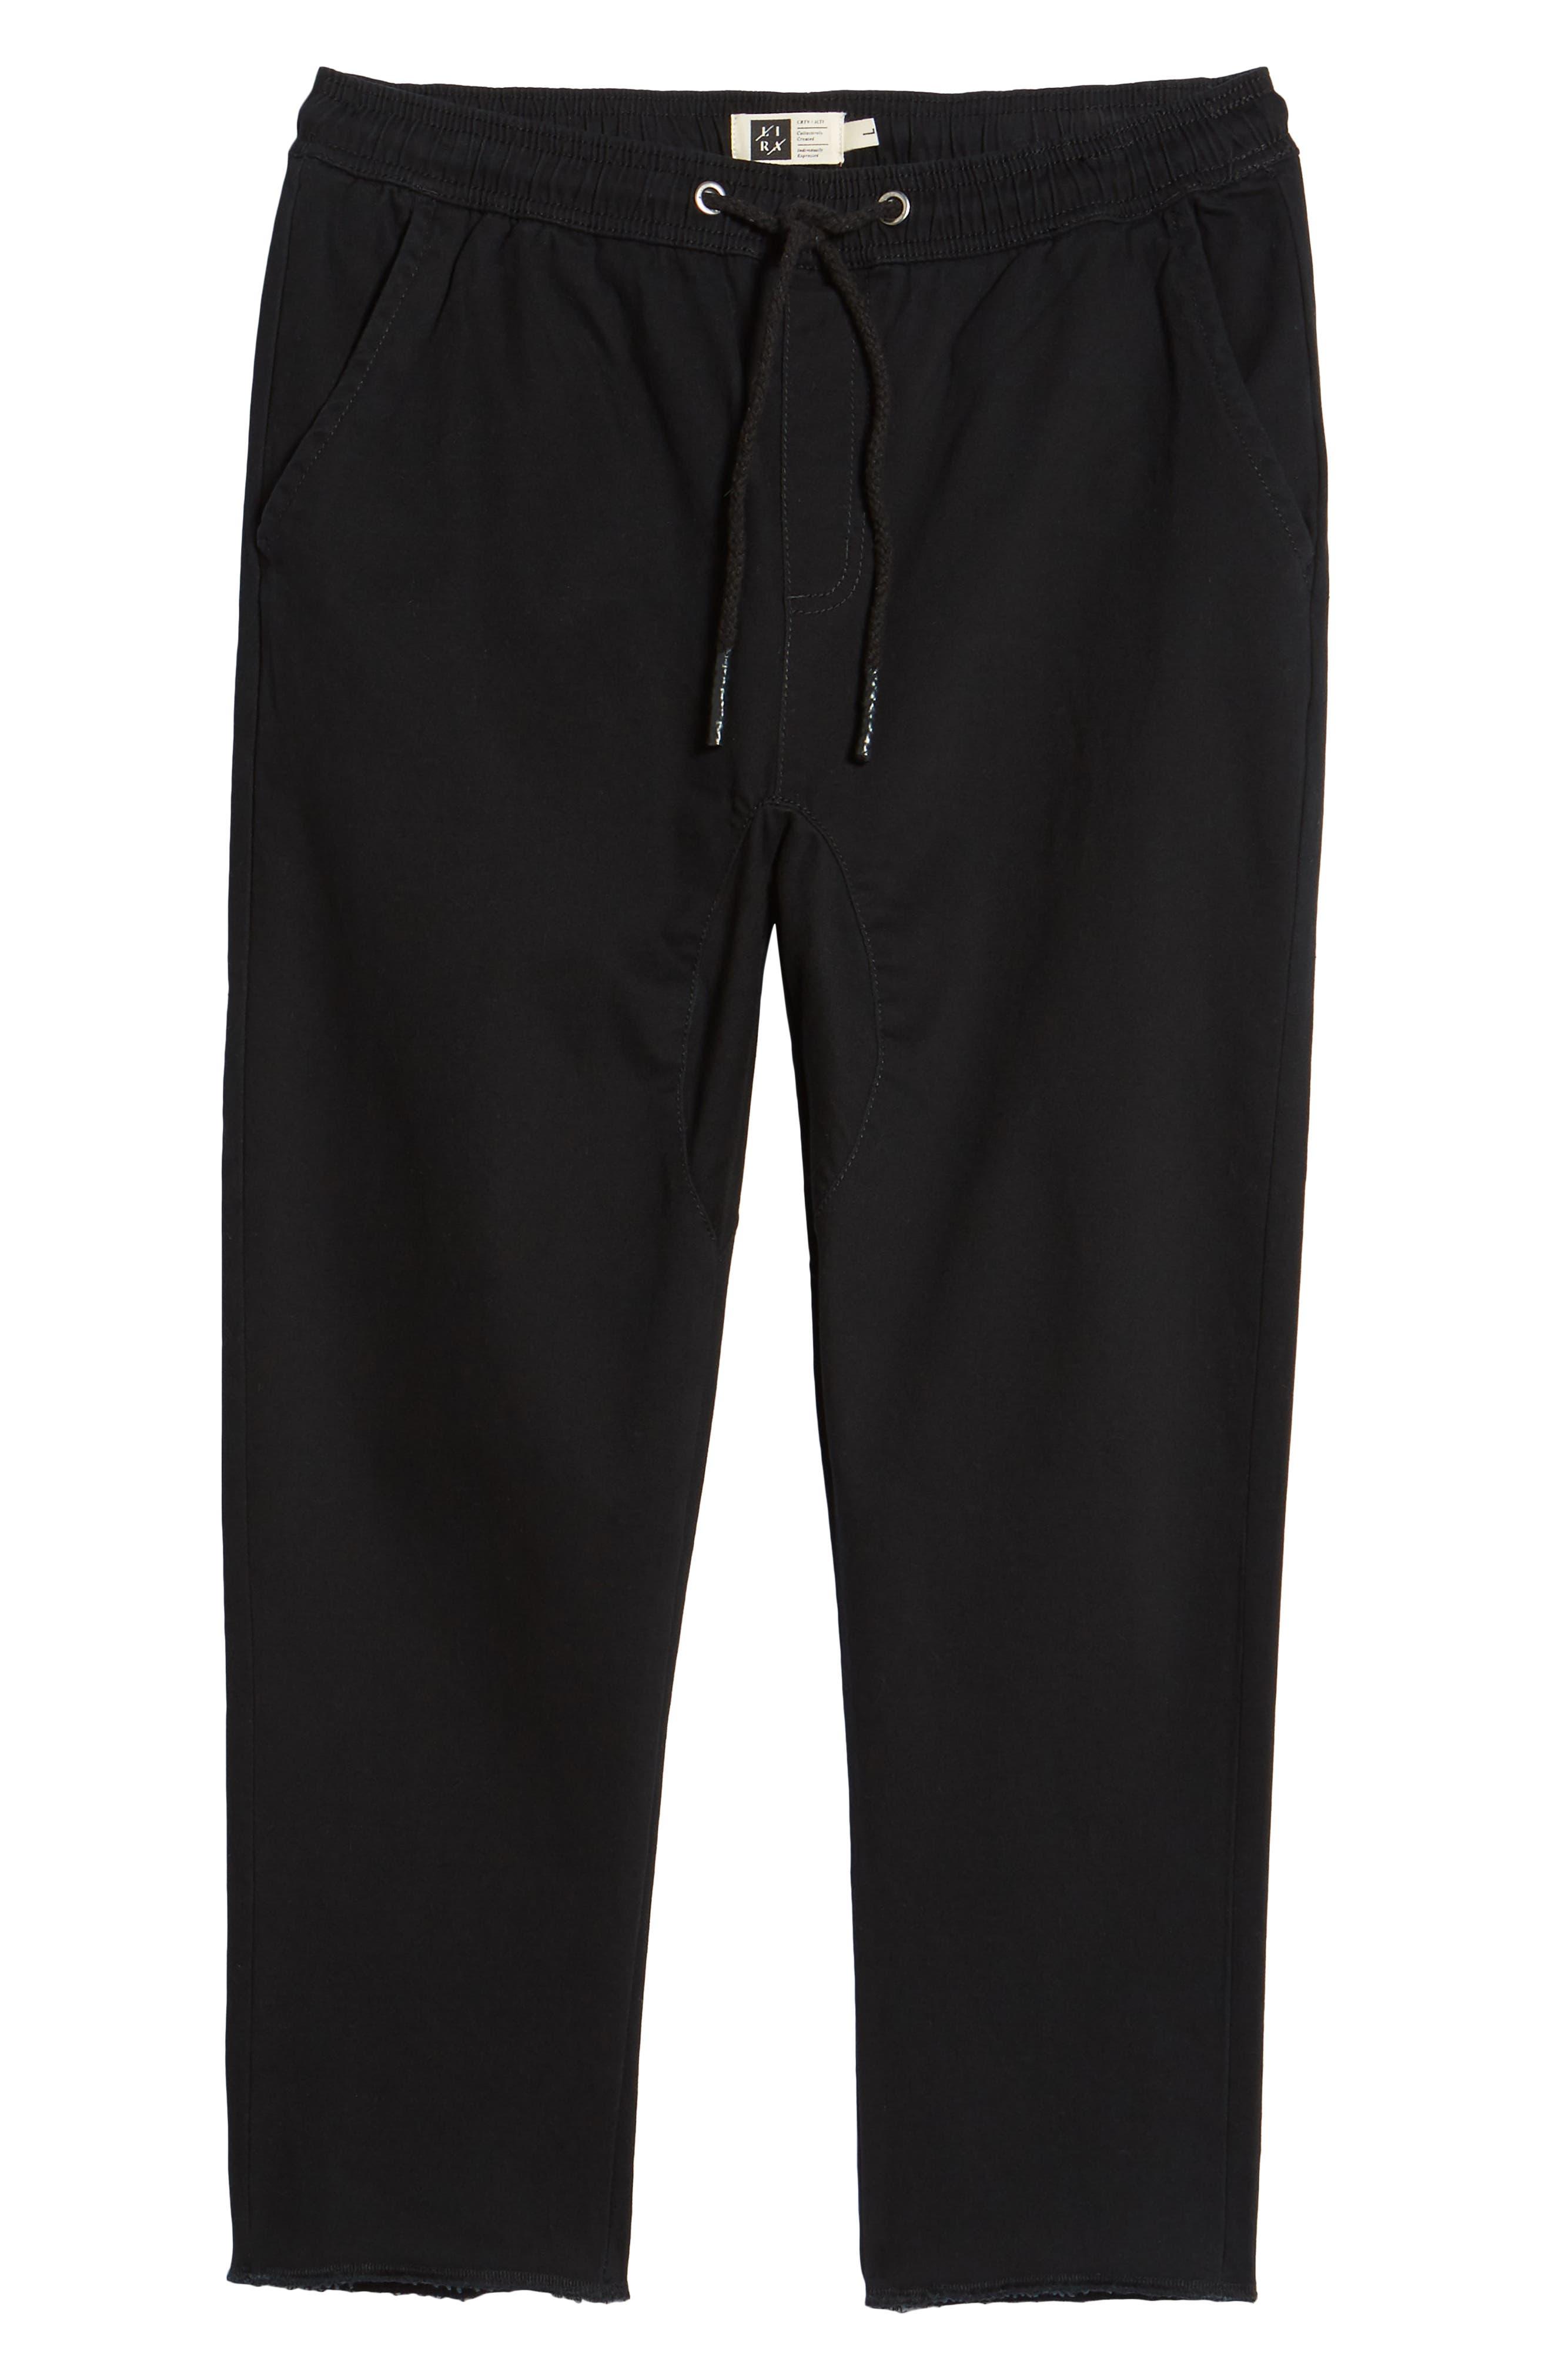 Crossroad Slim Fit Pants,                             Alternate thumbnail 6, color,                             BLACK